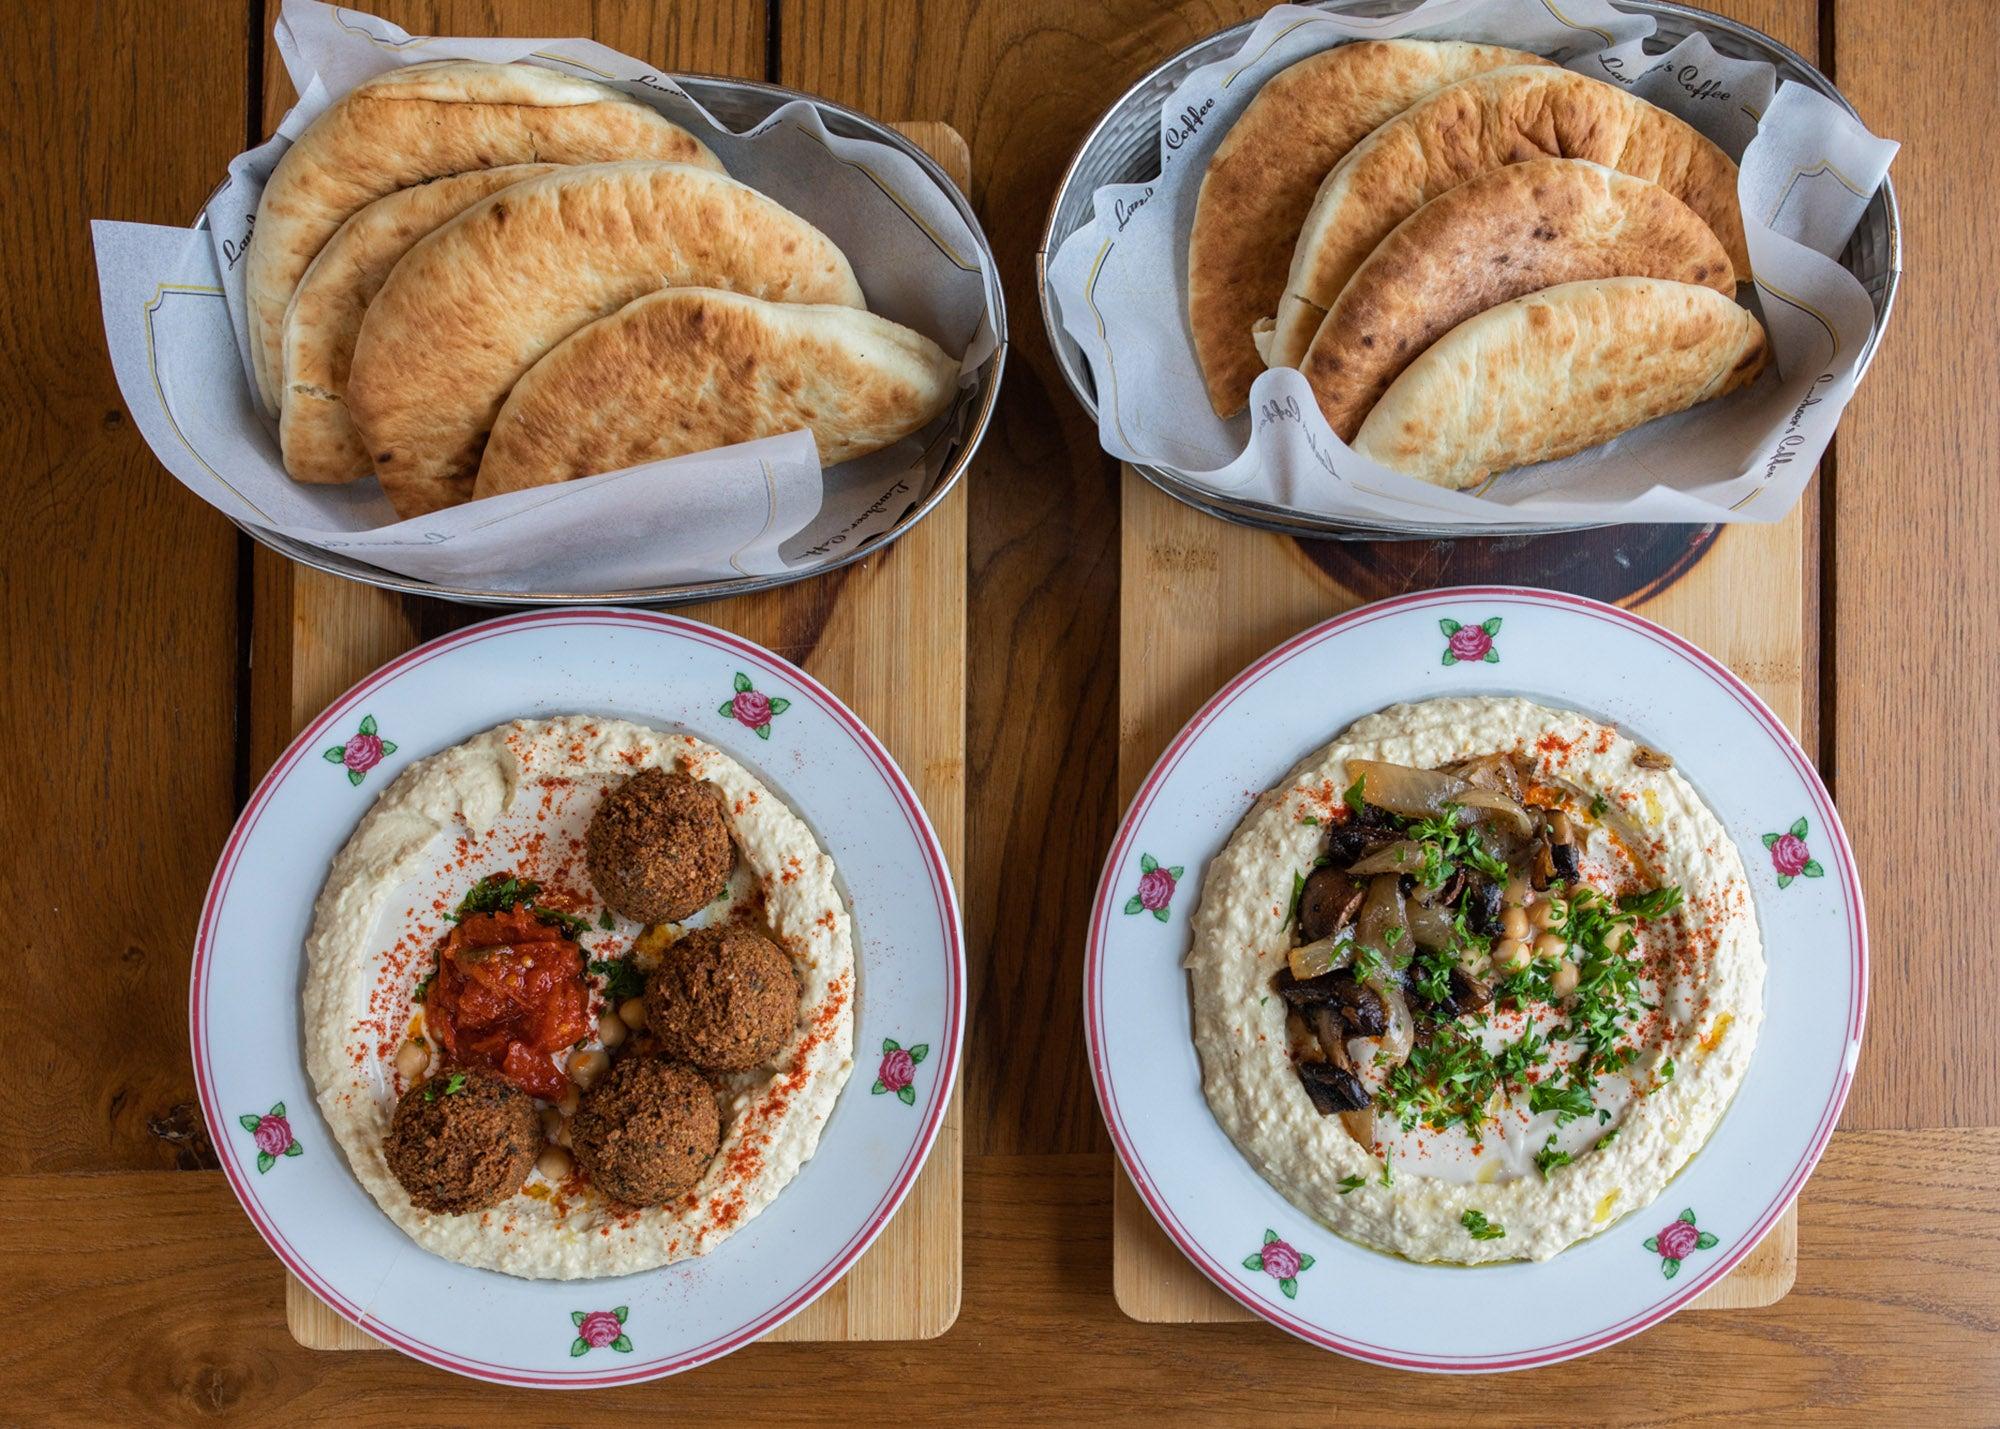 Souk and mushroom hummus bowls at Cafe Landwer